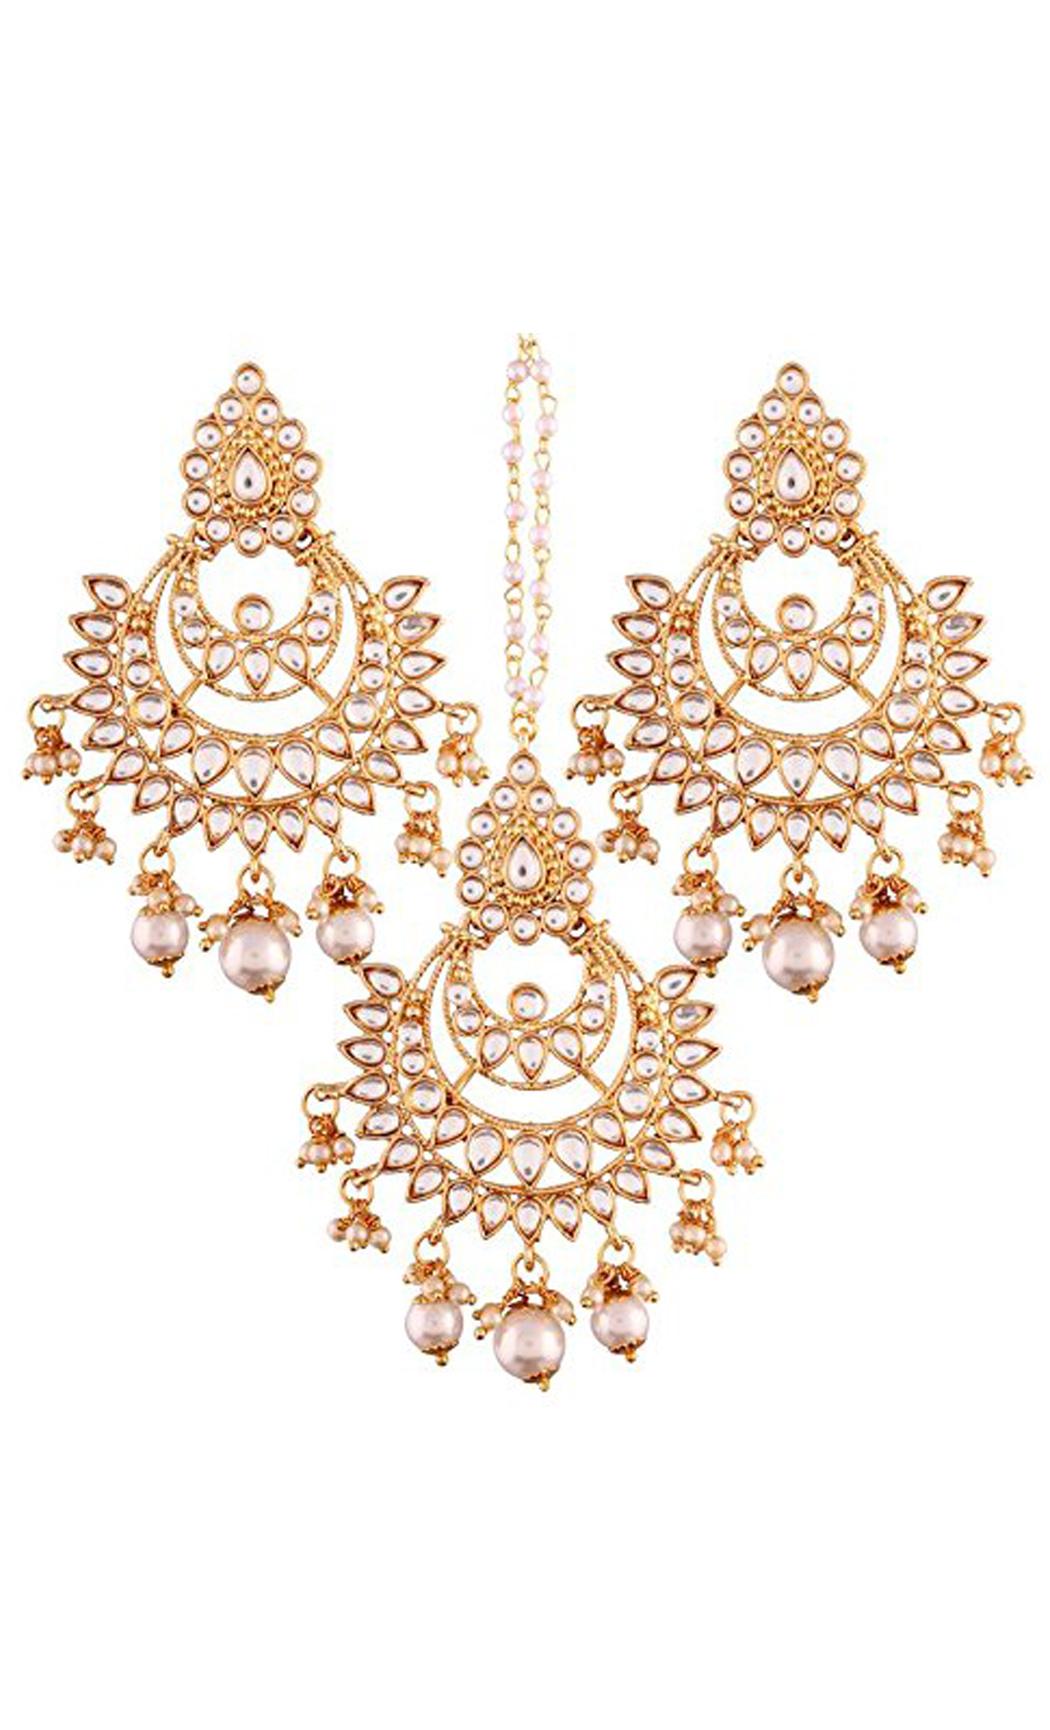 Kundan and Pearl Chaandbali Earrings and Maang Tikka Gold Plated | Indian Bridal Jewellery Collection